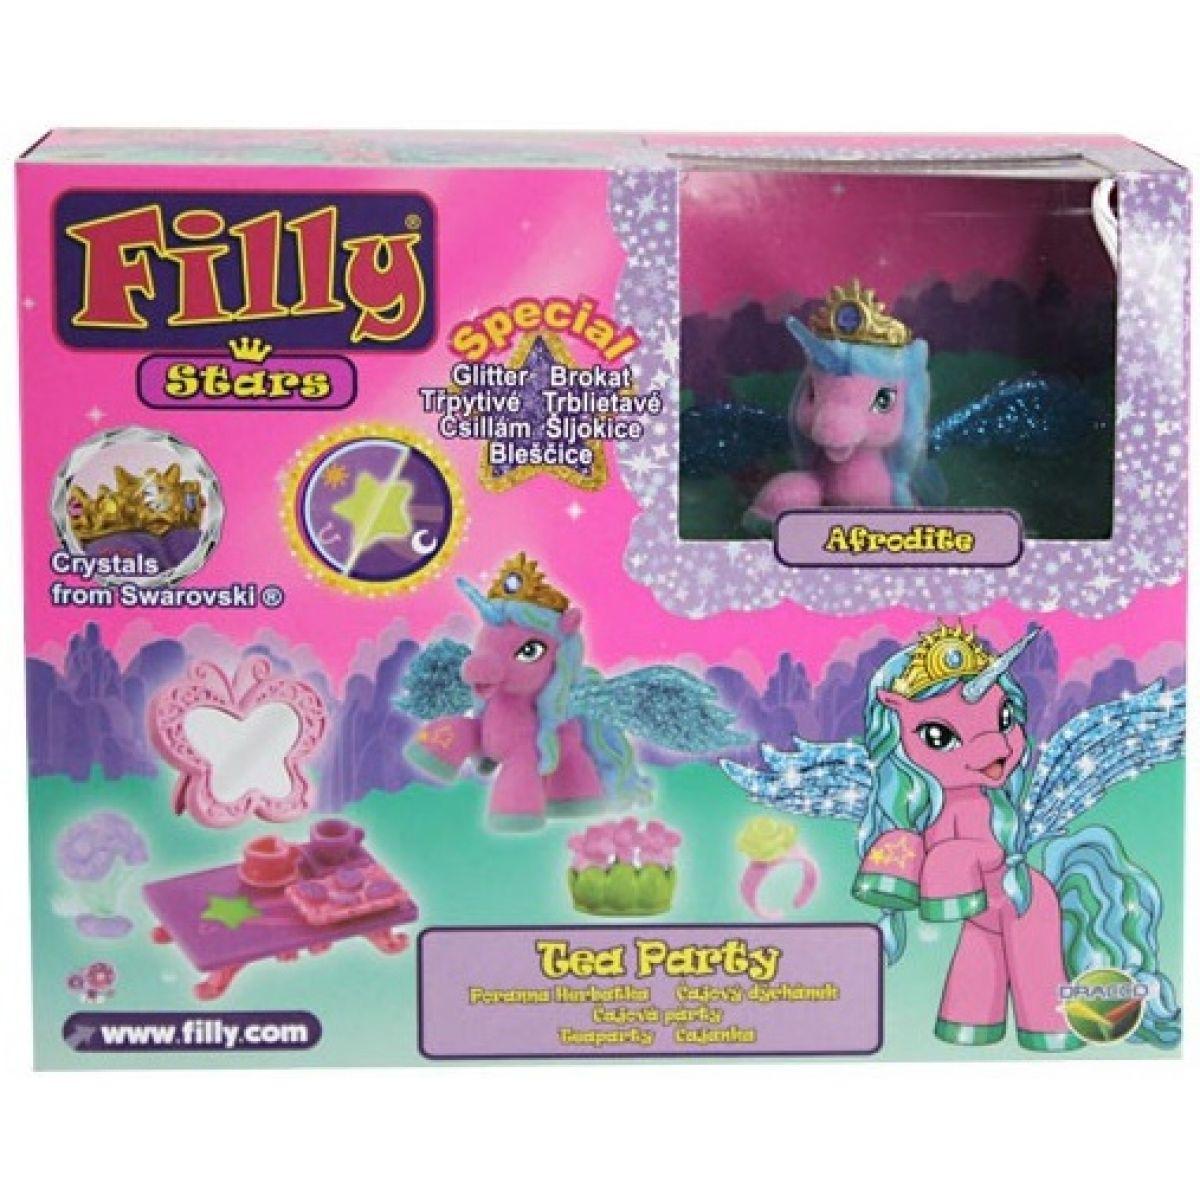 Filly Stars Glitter Hracia sada - Čajový dýchánek